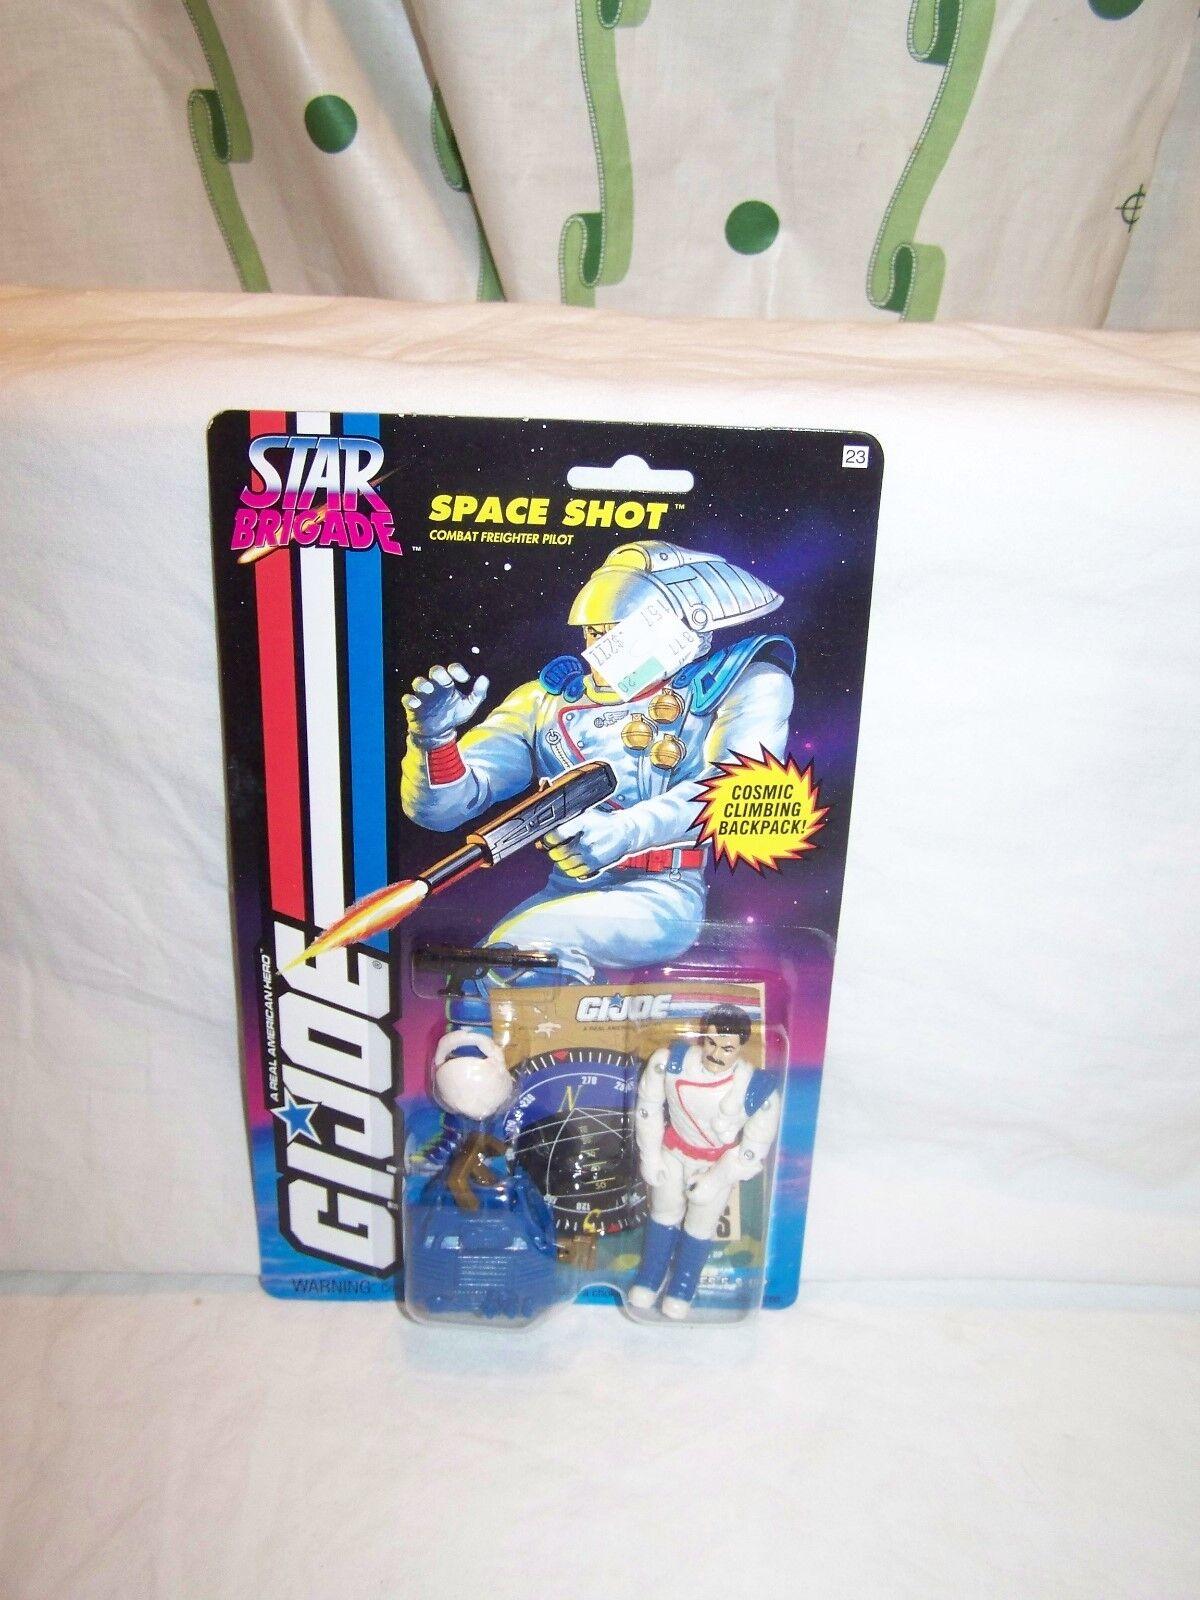 Vintage GI Joe Space Shot Star Brigade Action Figure 1993 Factory Sealed MOC